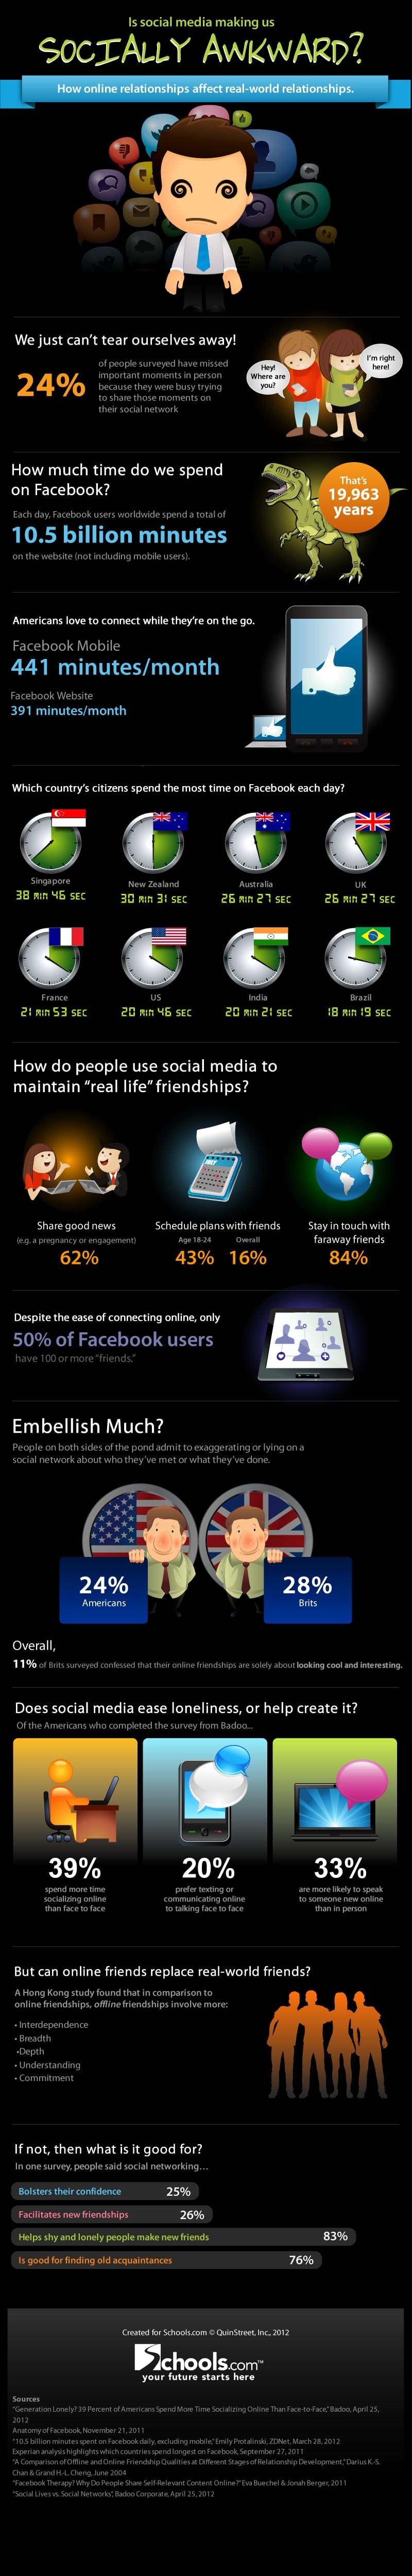 we-become-socially-awkward-infographic